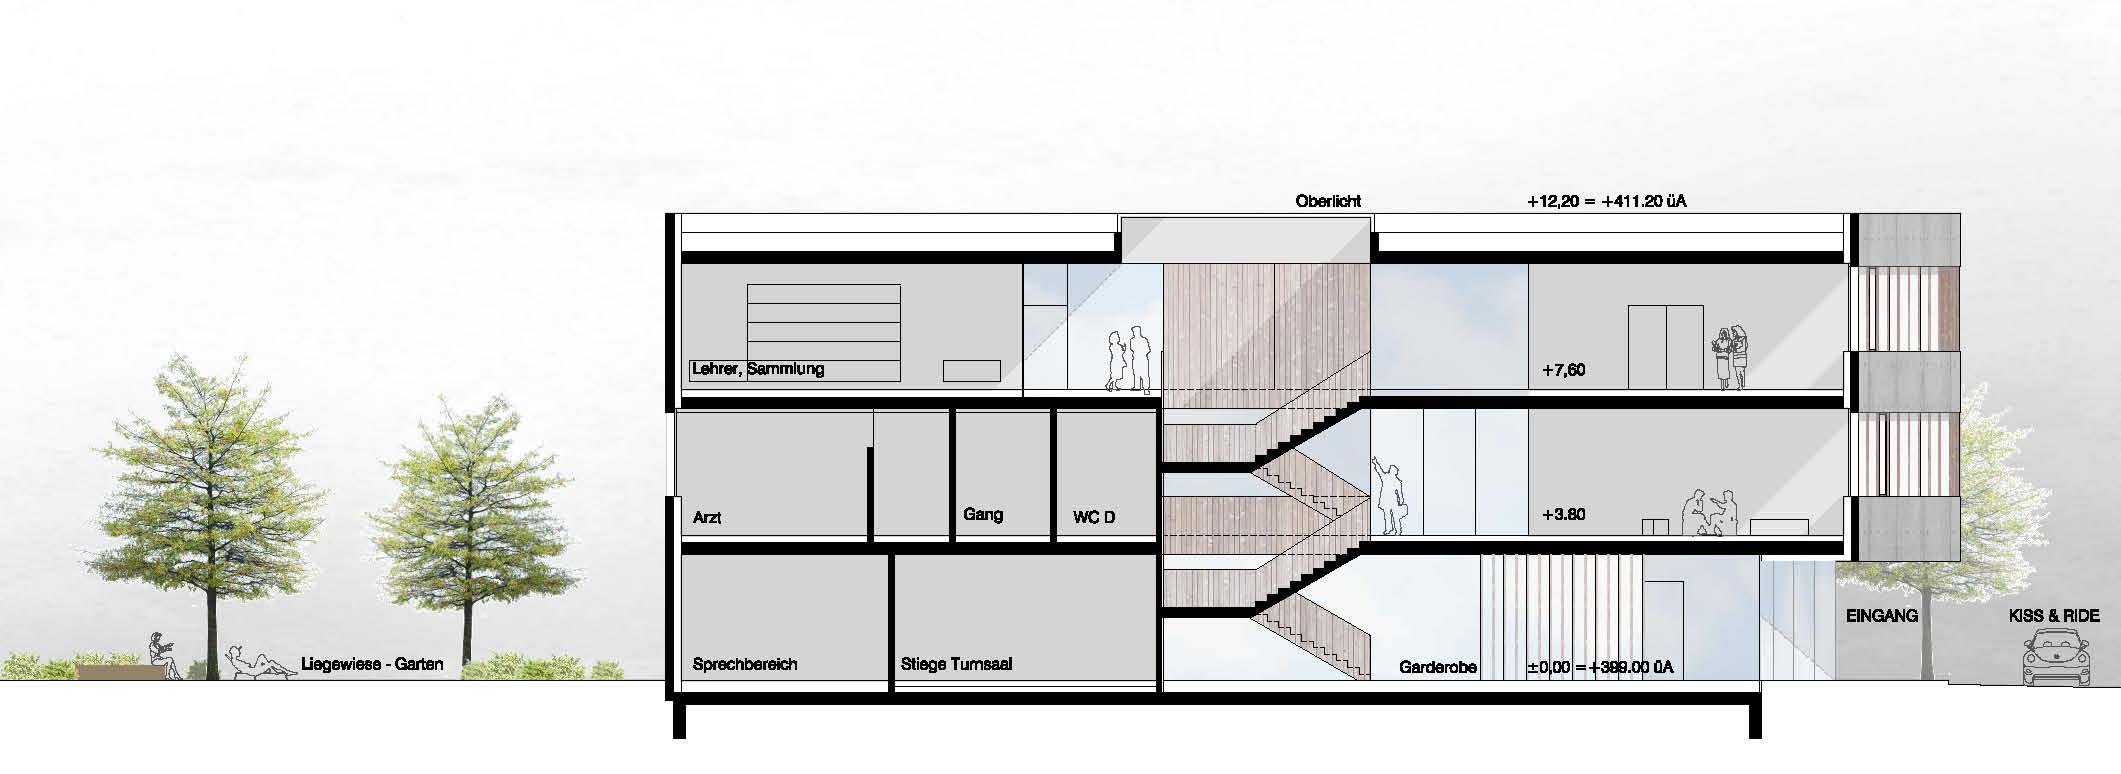 14 Wb Bo Schnitt 1 Waax Architekten Zt Gmbh